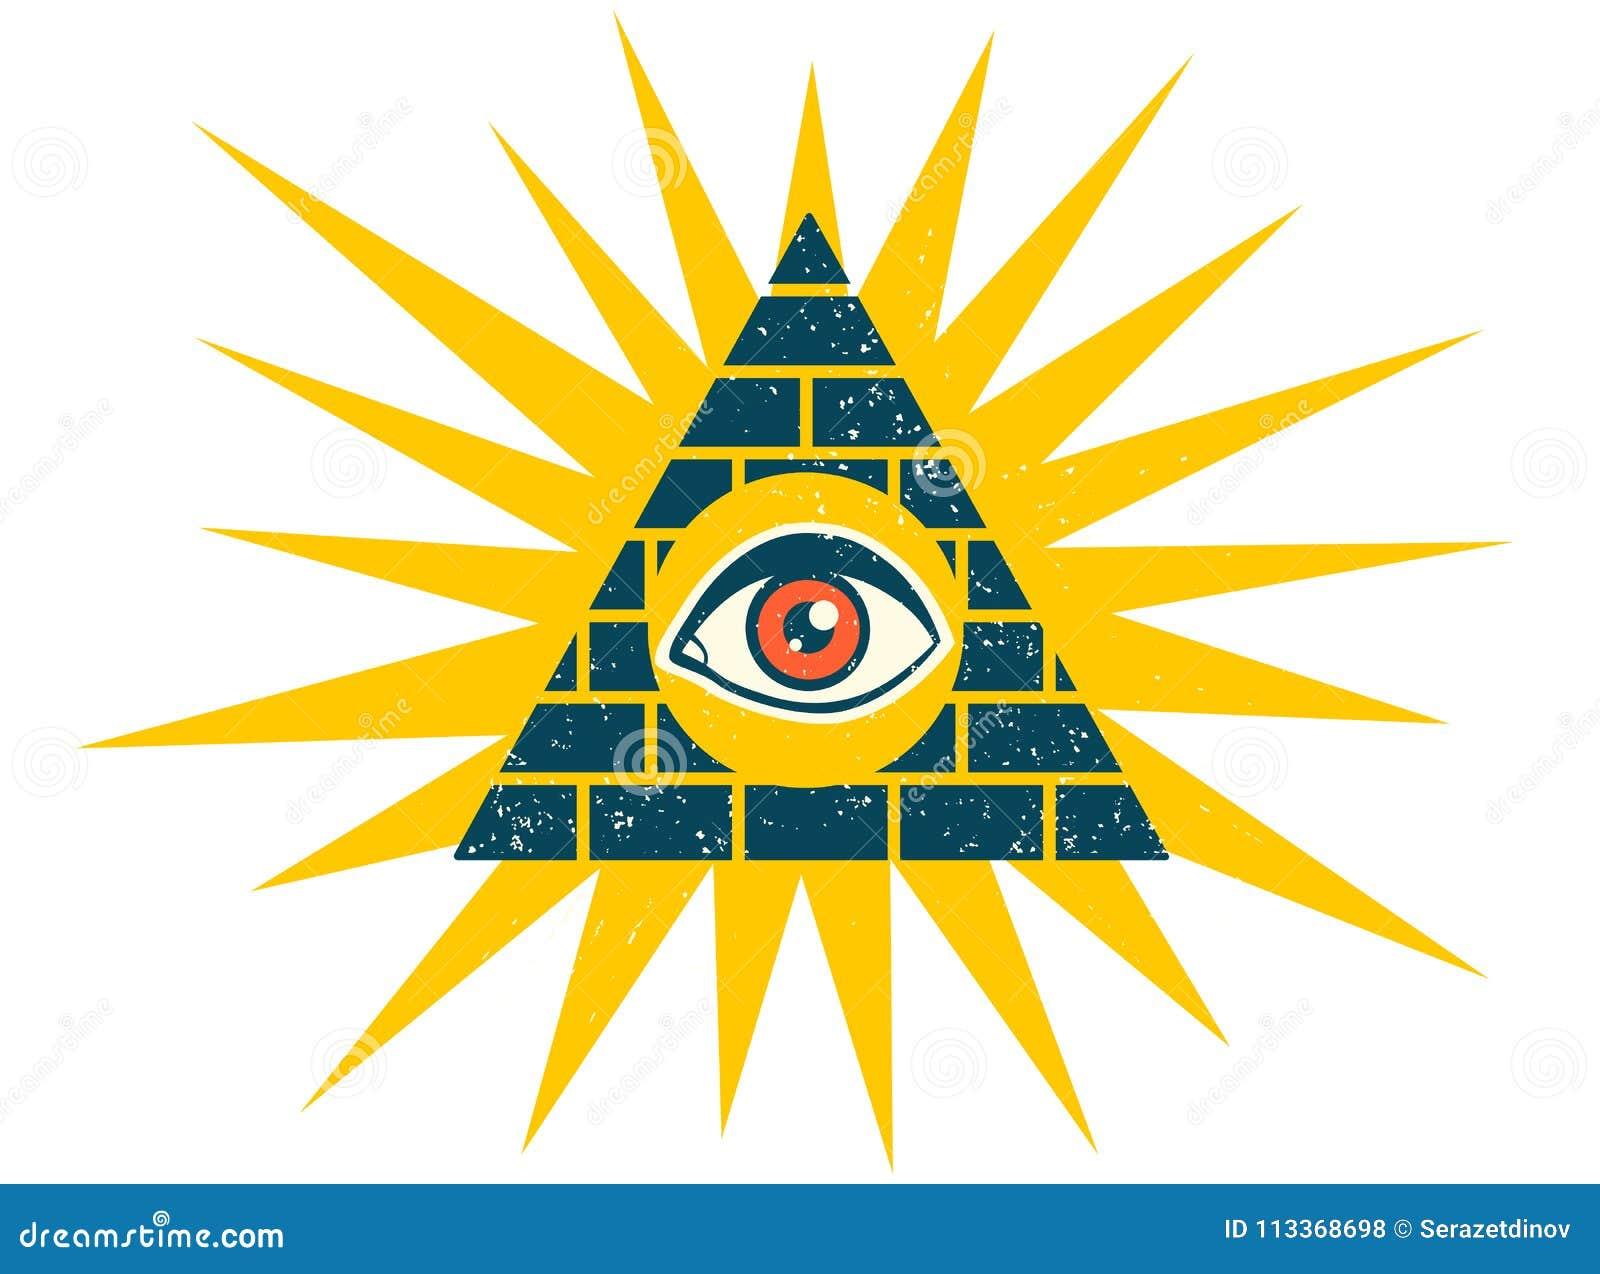 Pirâmide com olho